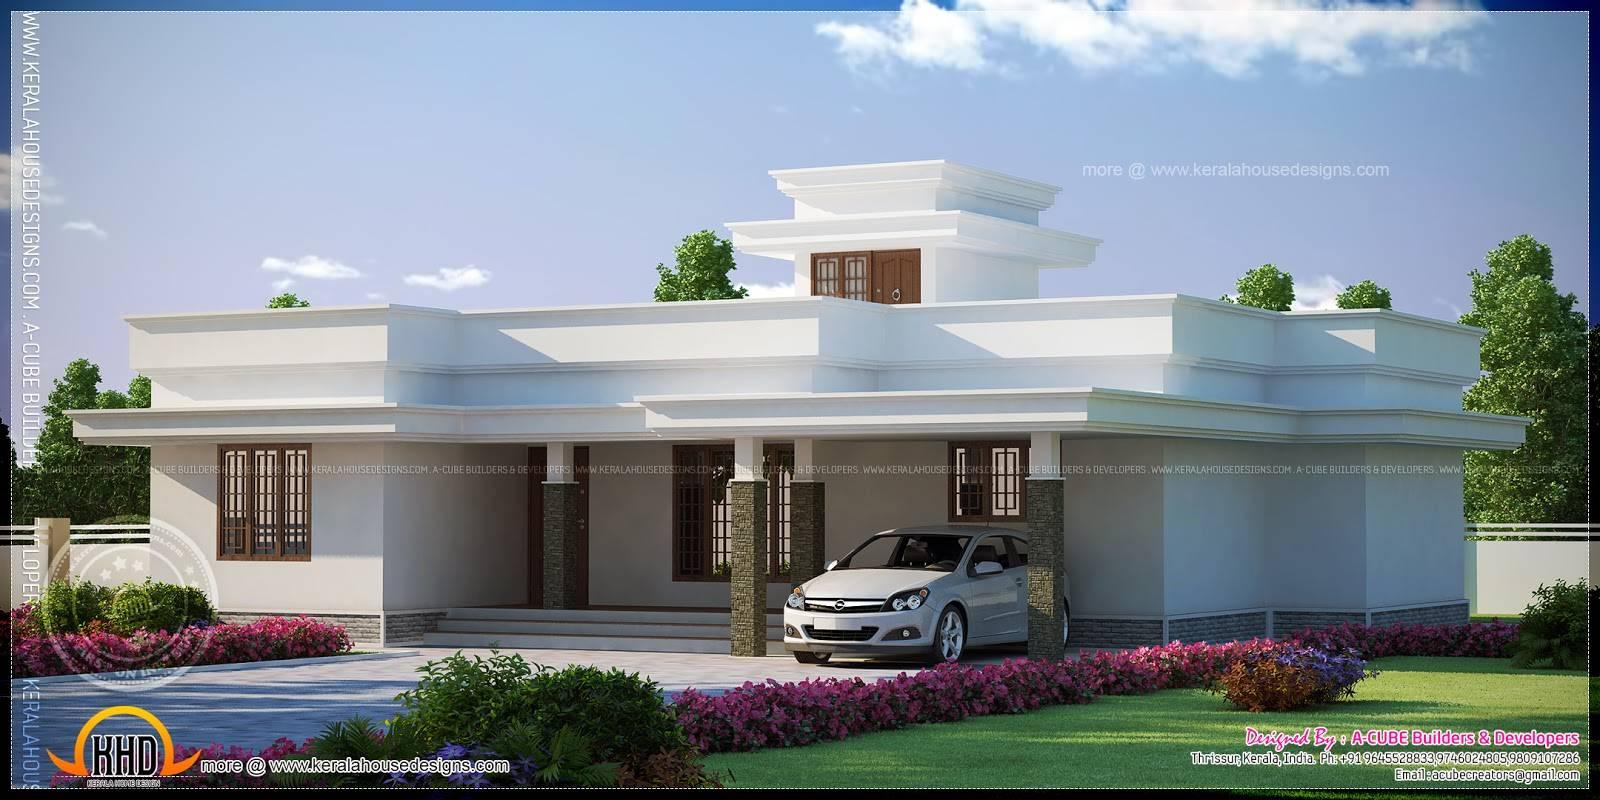 Contemporary Flat Roof Single Storied House Model Kerala Home Design Home Plans Blueprints 59406